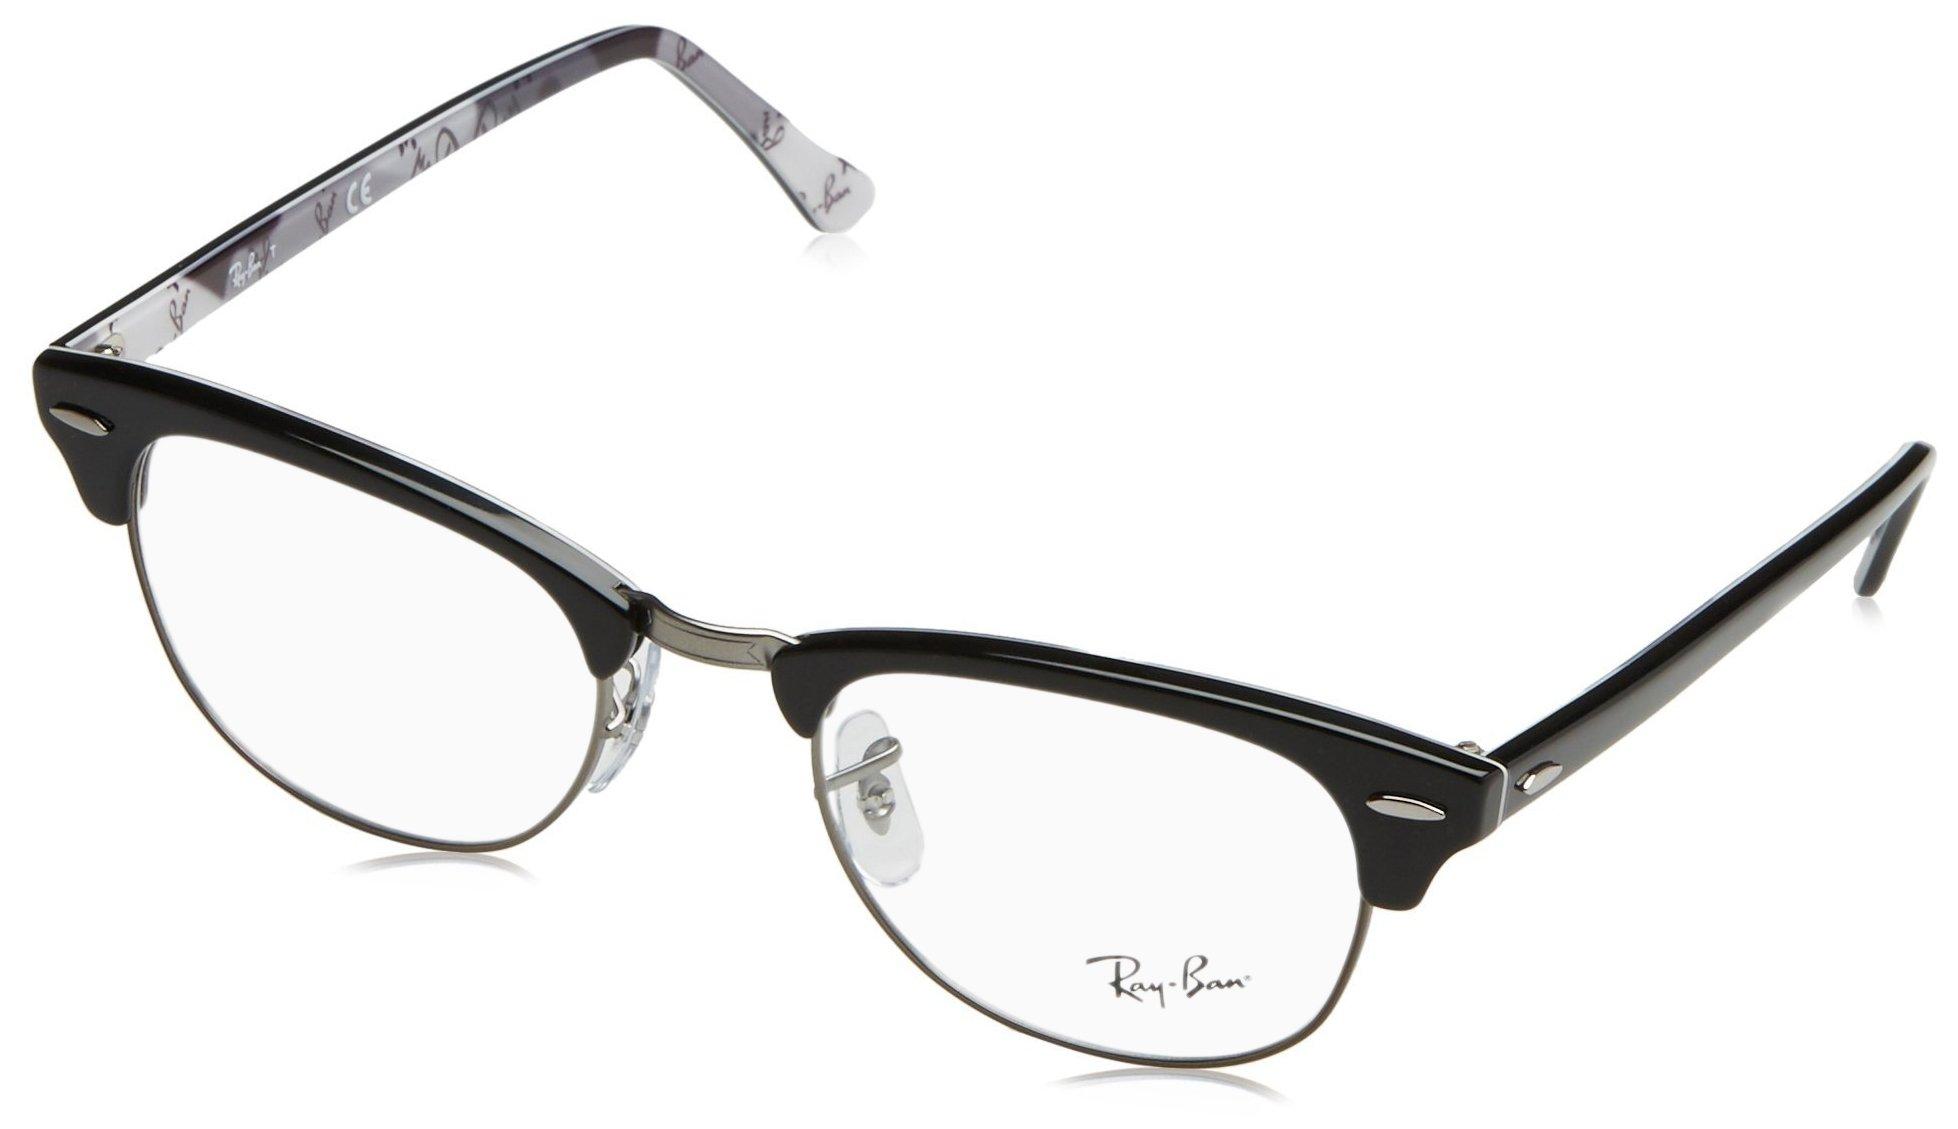 Ray-Ban Clubmaster Square Eyeglasses, Tortoise, 49 mm